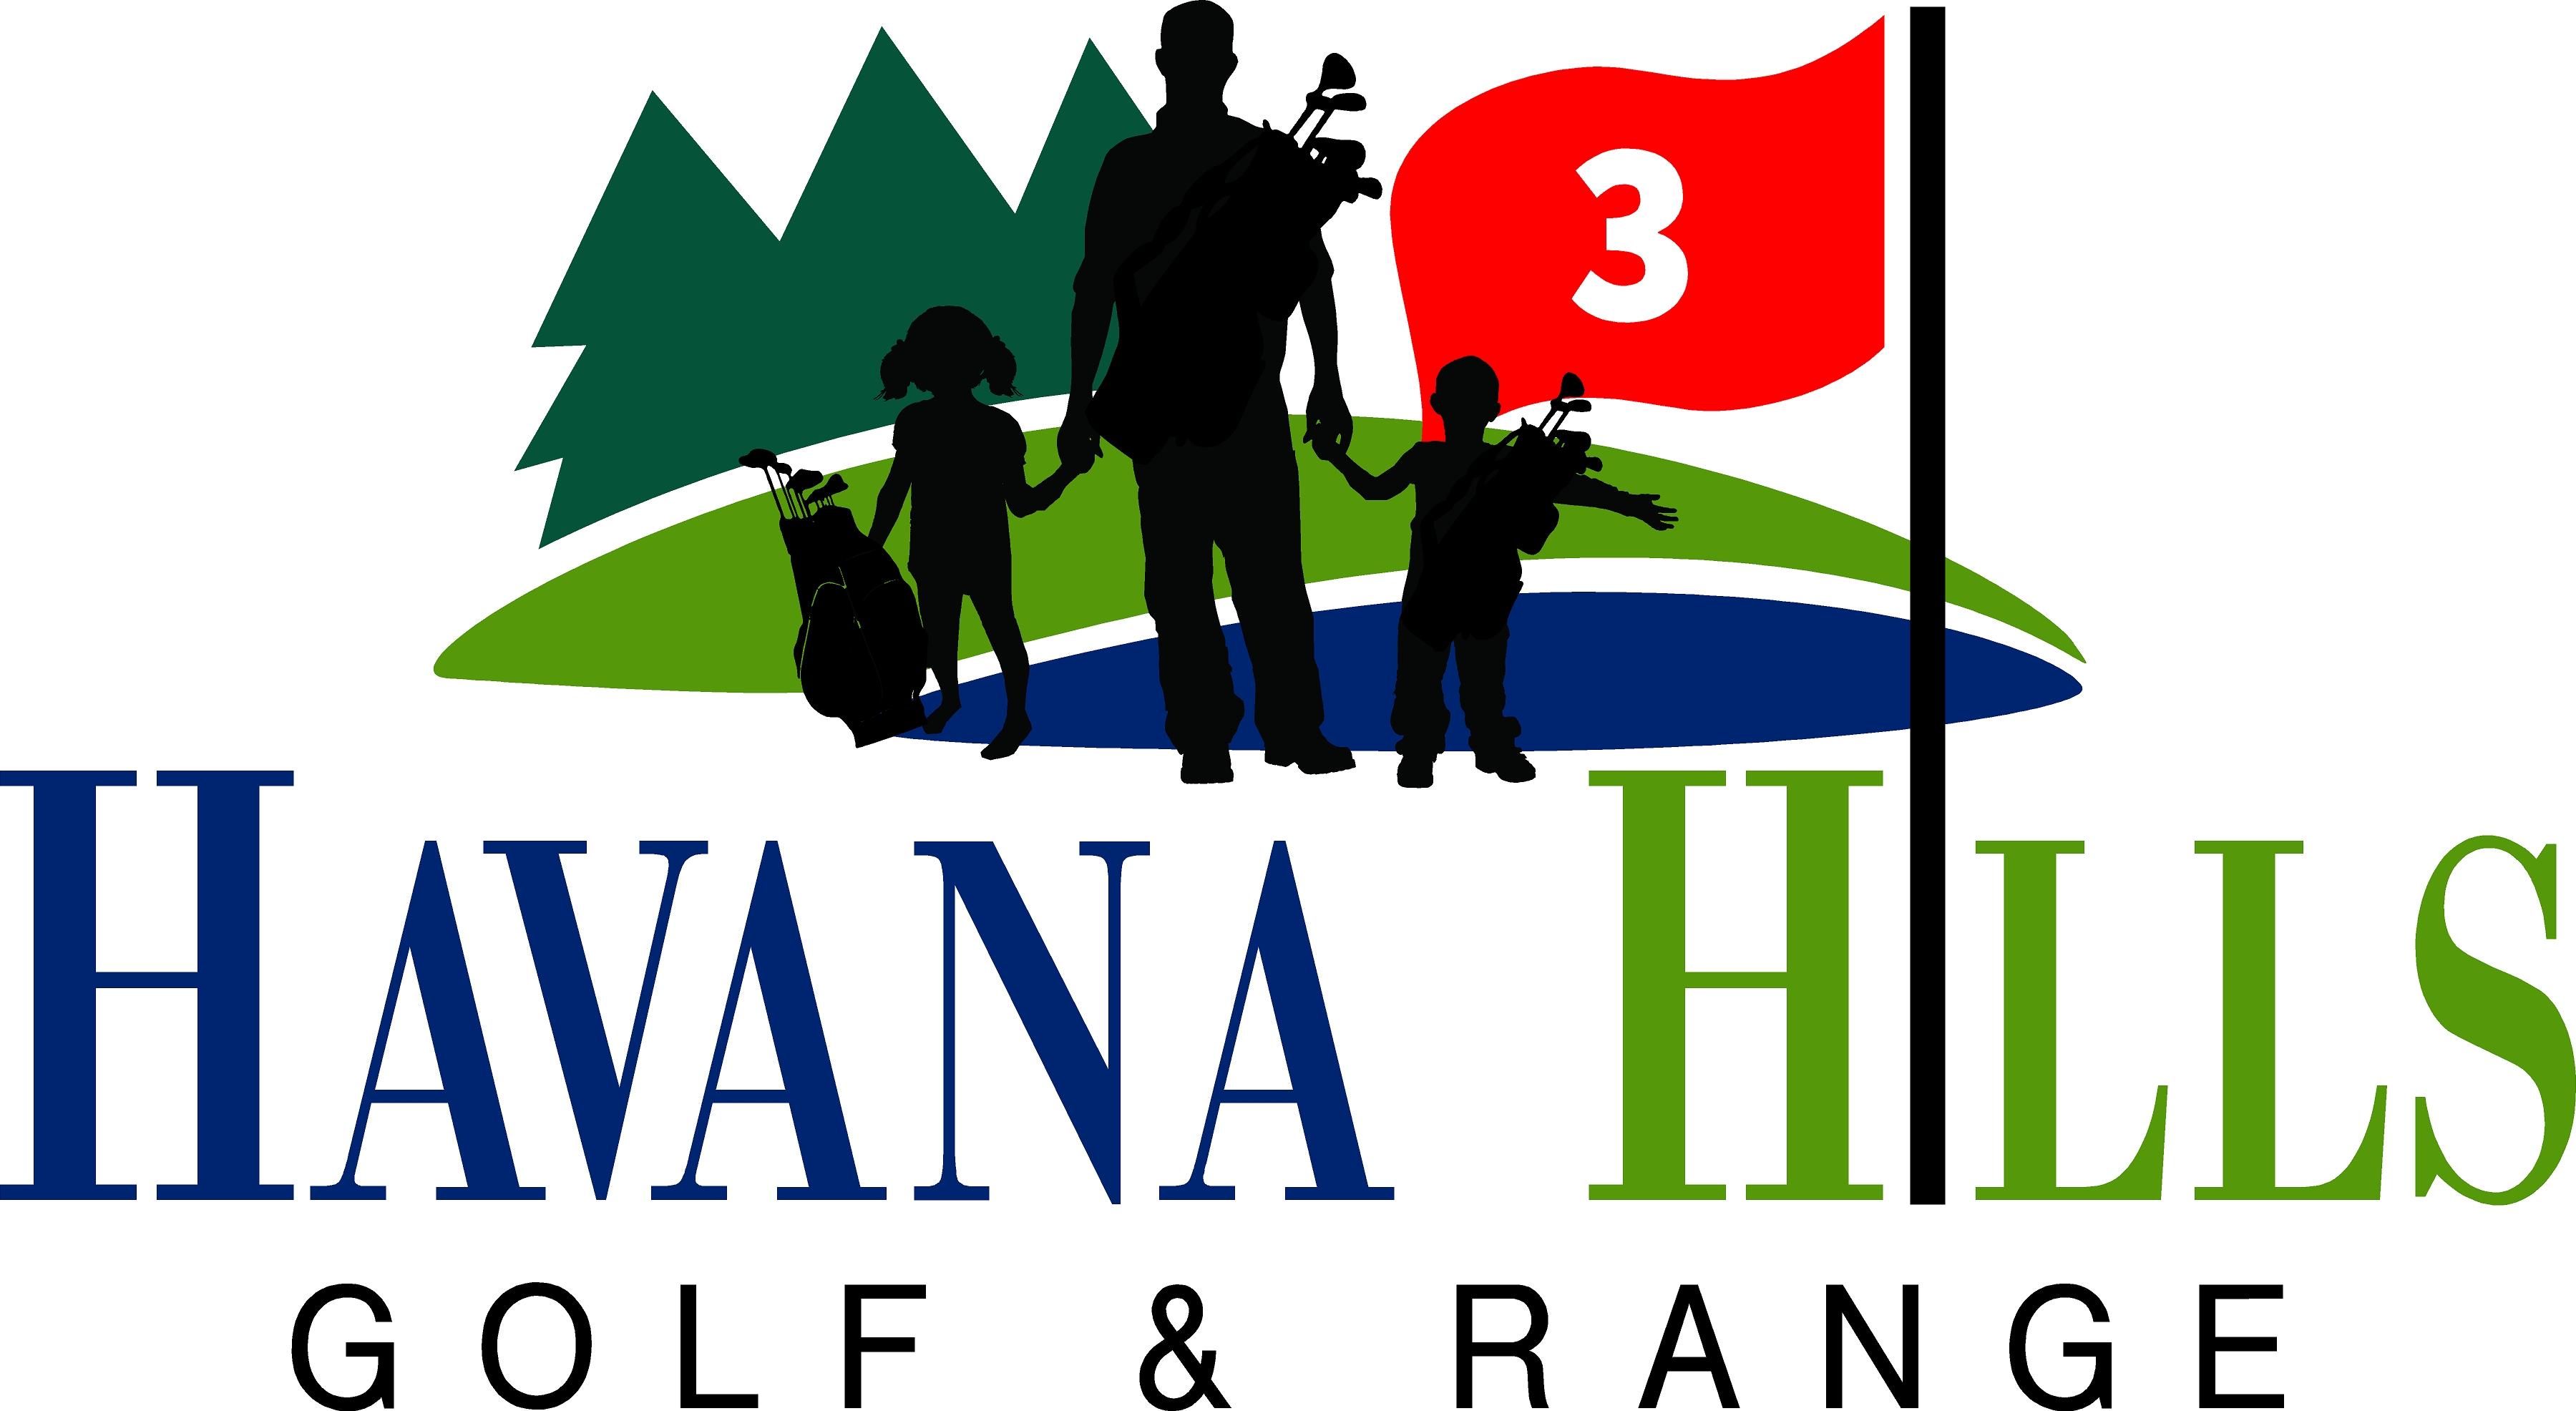 Havana Hills Golf and Driving Range